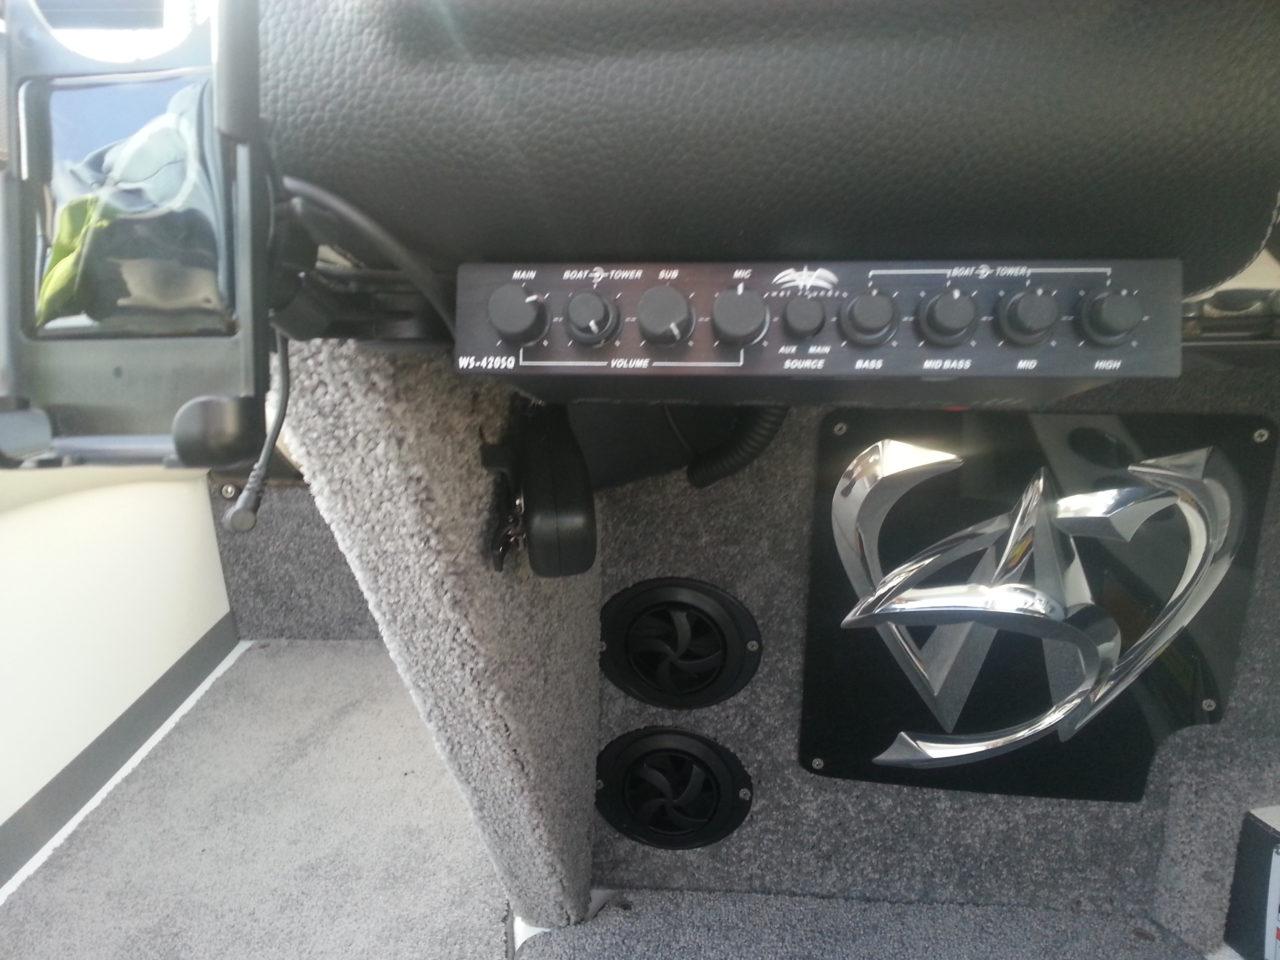 Malibu vlx wet sounds rev (2)